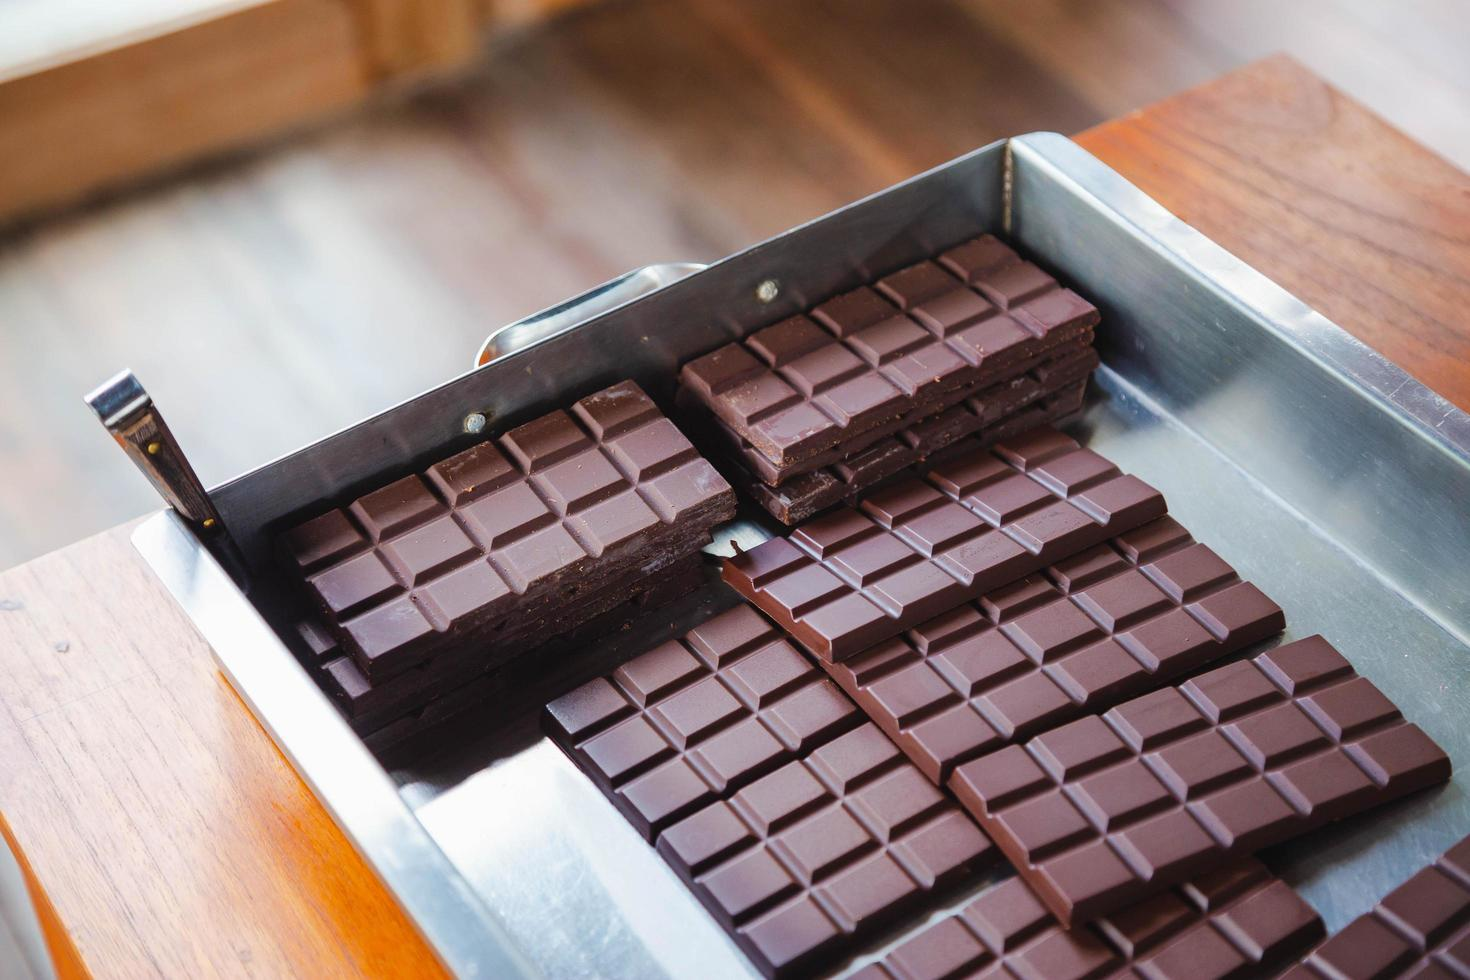 Homemade dark chocolate and cocoa photo